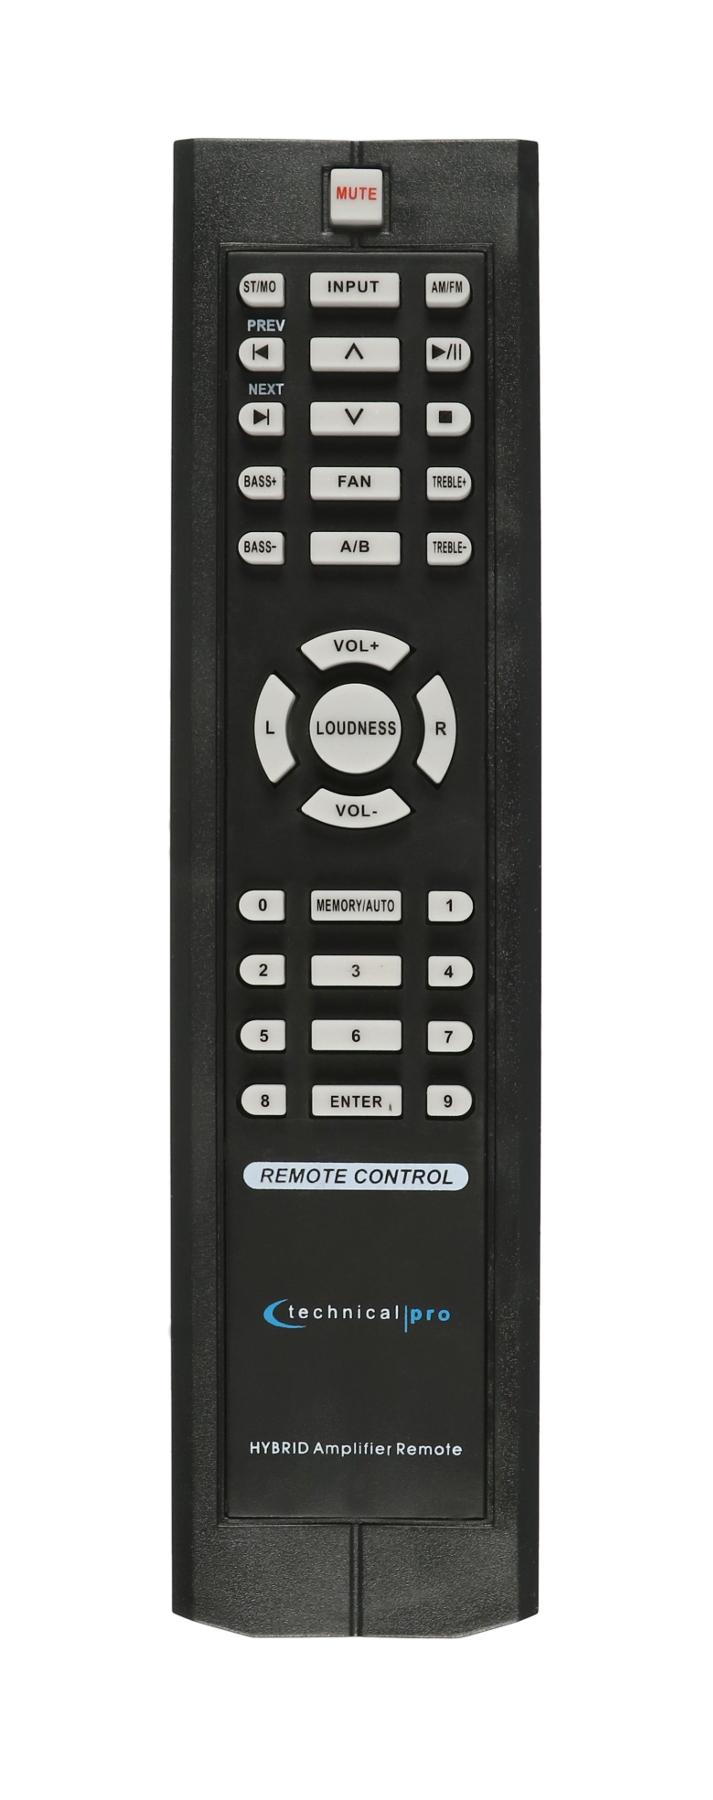 Remote Control for HB1502U